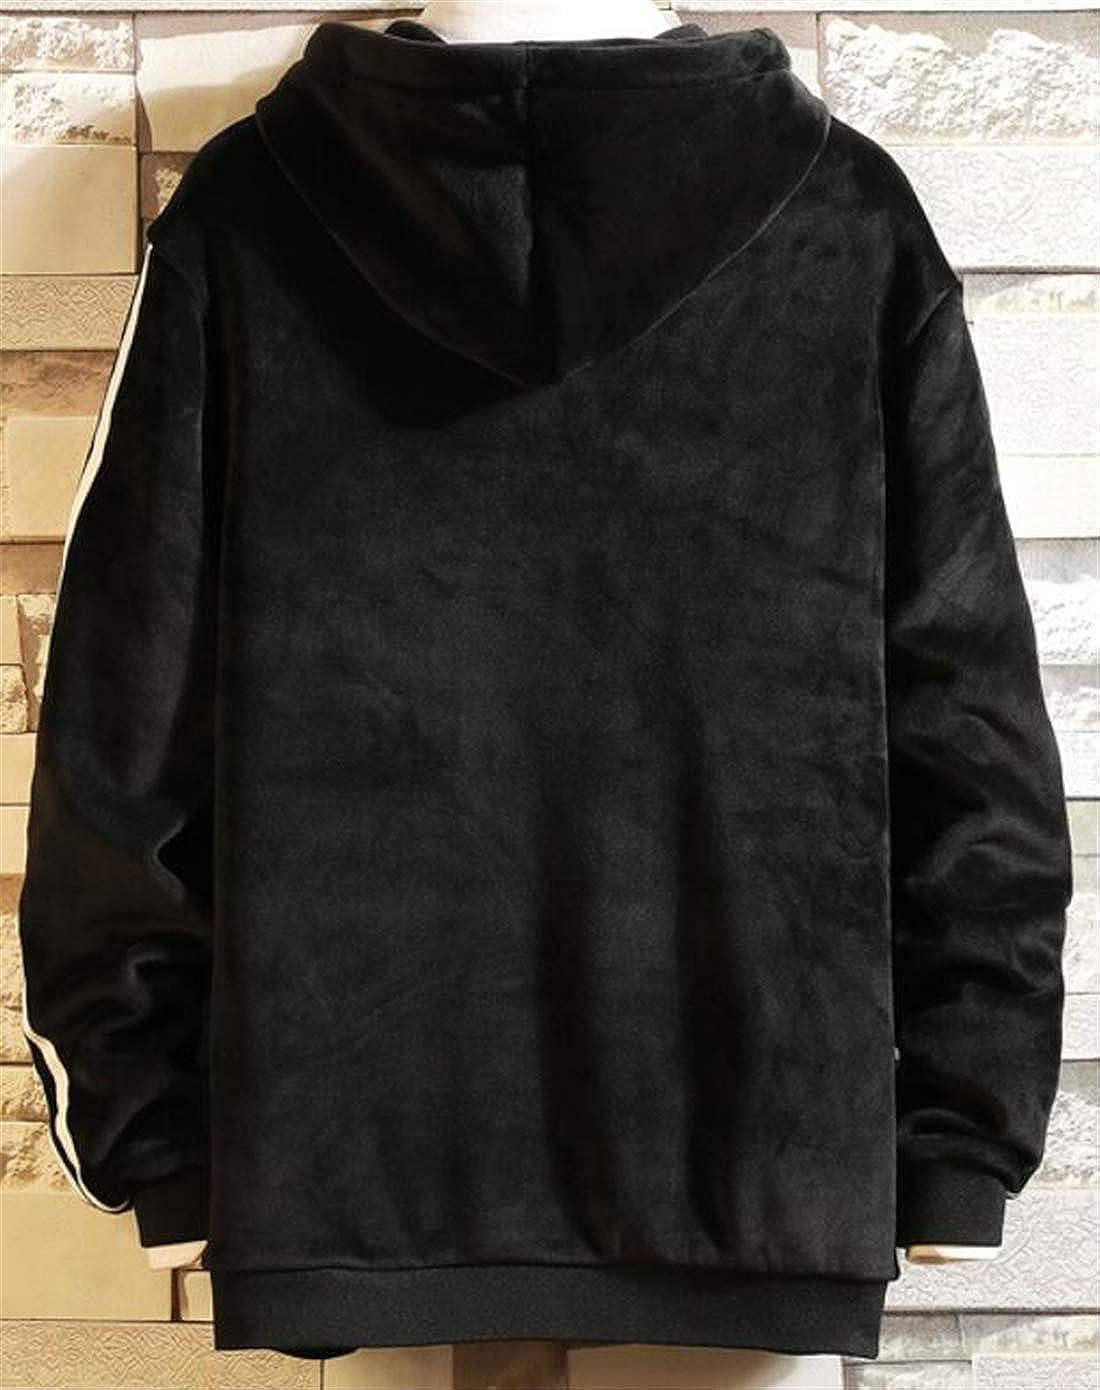 Hilization Mens Casual Hooded Striped Drawstring Fleece Lined Velvet Warm Kangaroo Pocket Pullover Hoodie Sweatshirt